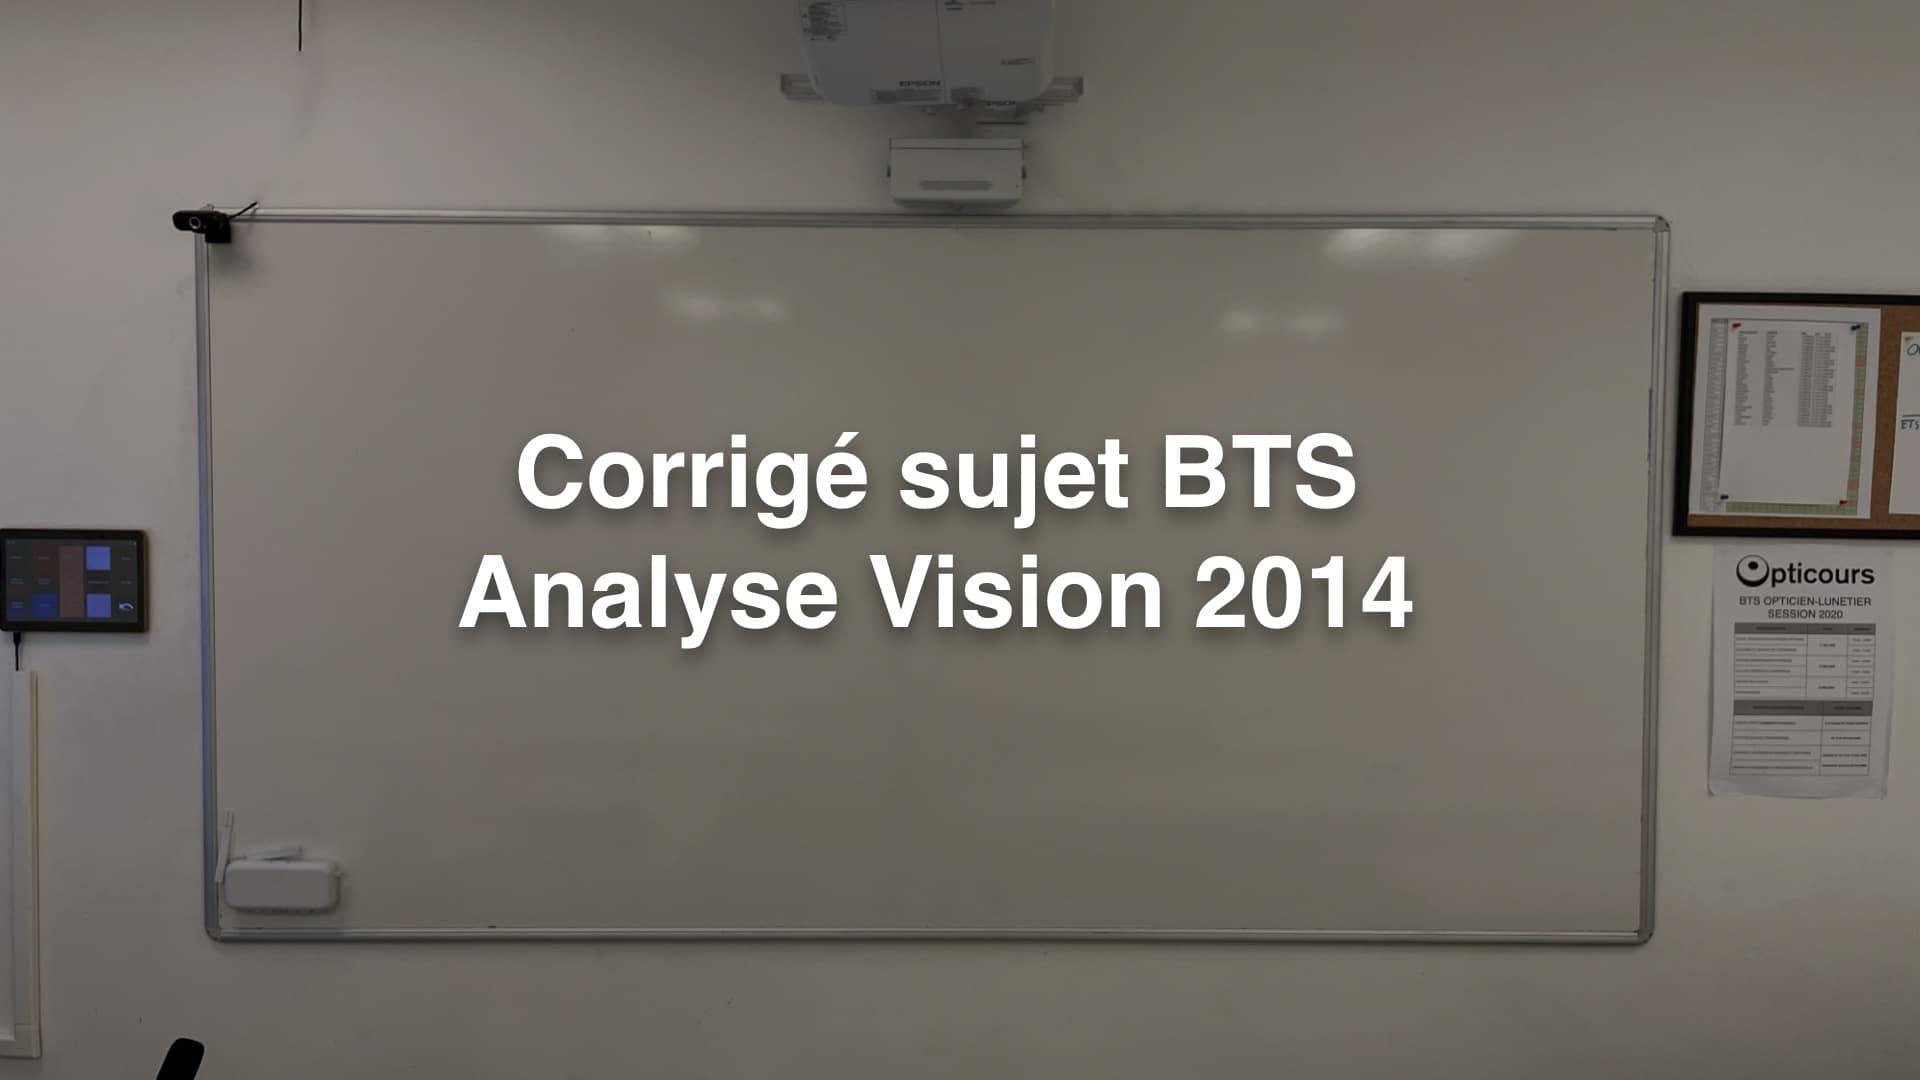 Corrigé sujet BTS Analyse Vision 2014